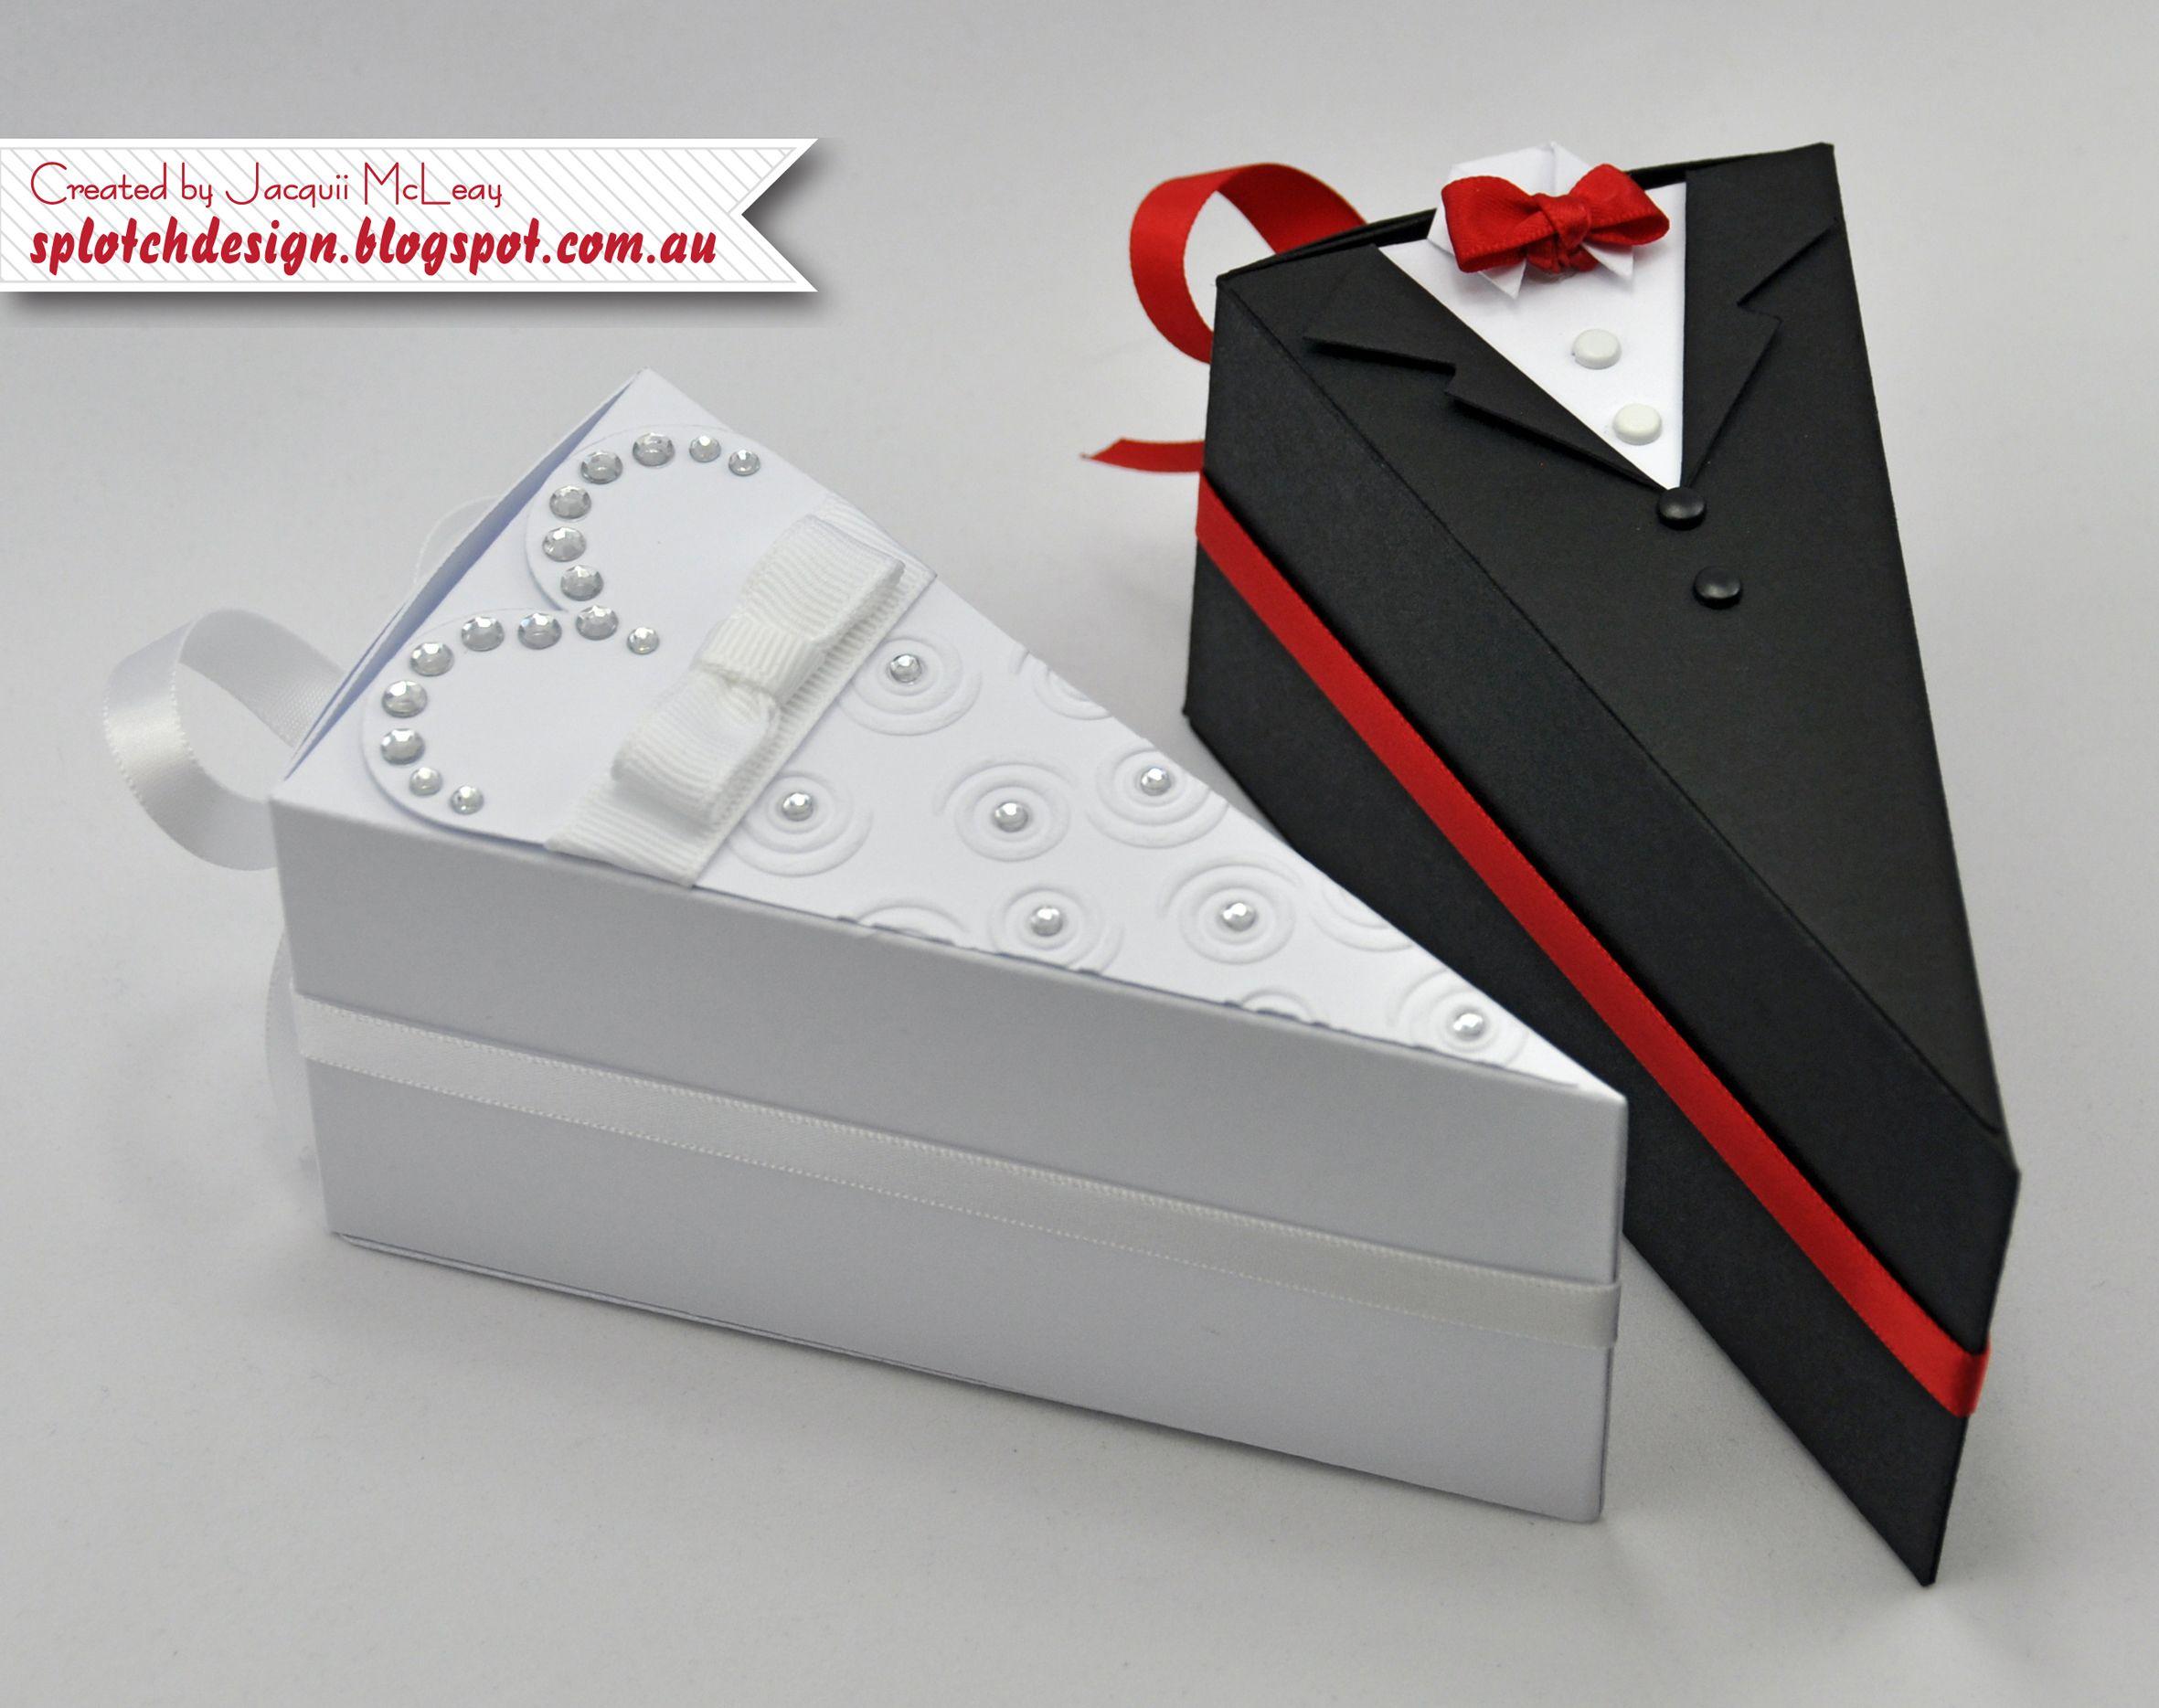 Splotch Design Jacquii Mcleay Stampin Up Wedding Cake Boxes